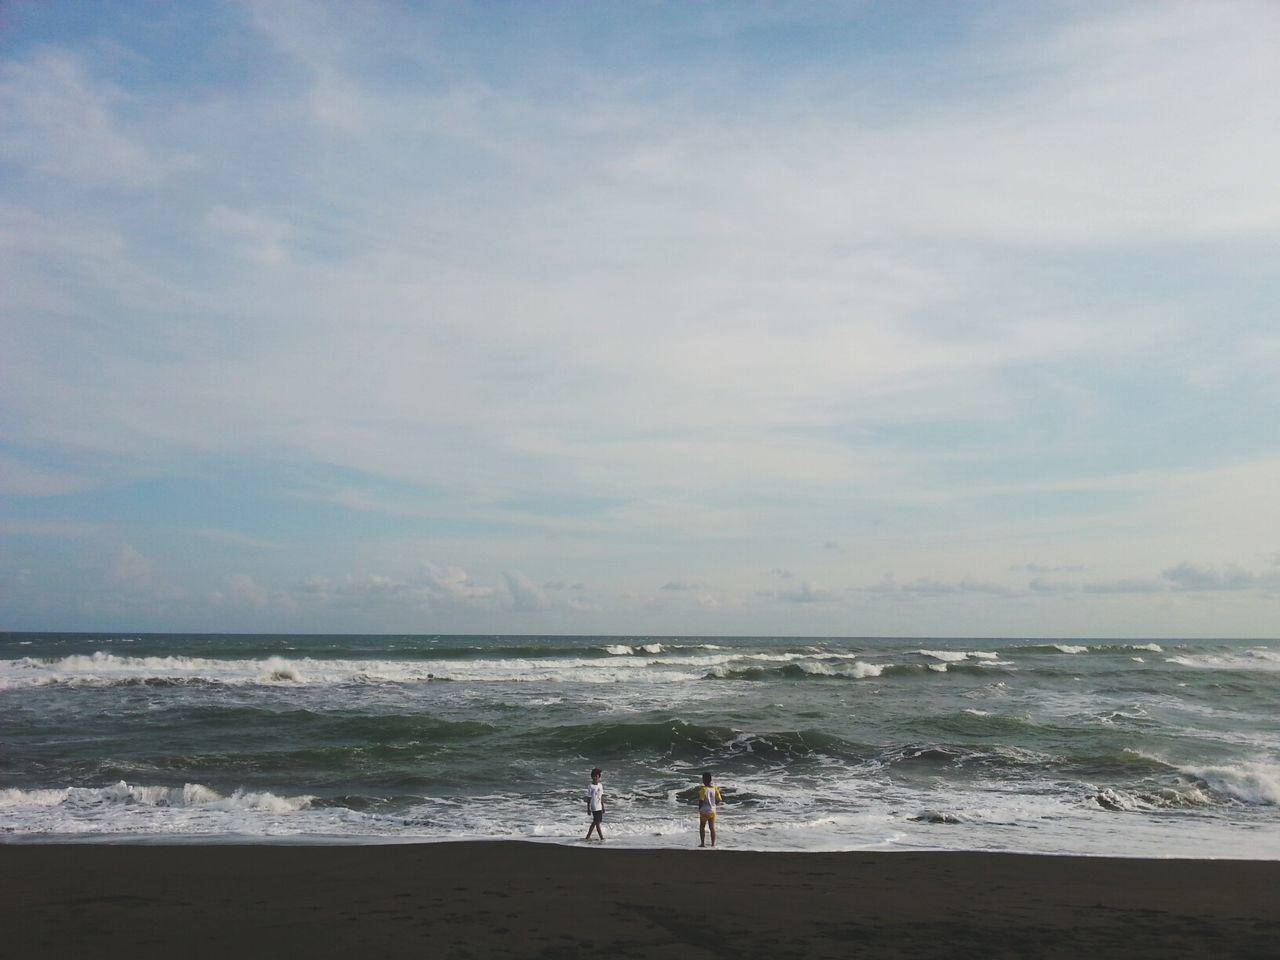 boys and waves : today we learn, tomorrow we'll surf Wave Seashore Photography SeashoreWalk Friendship First Eyeem Photo